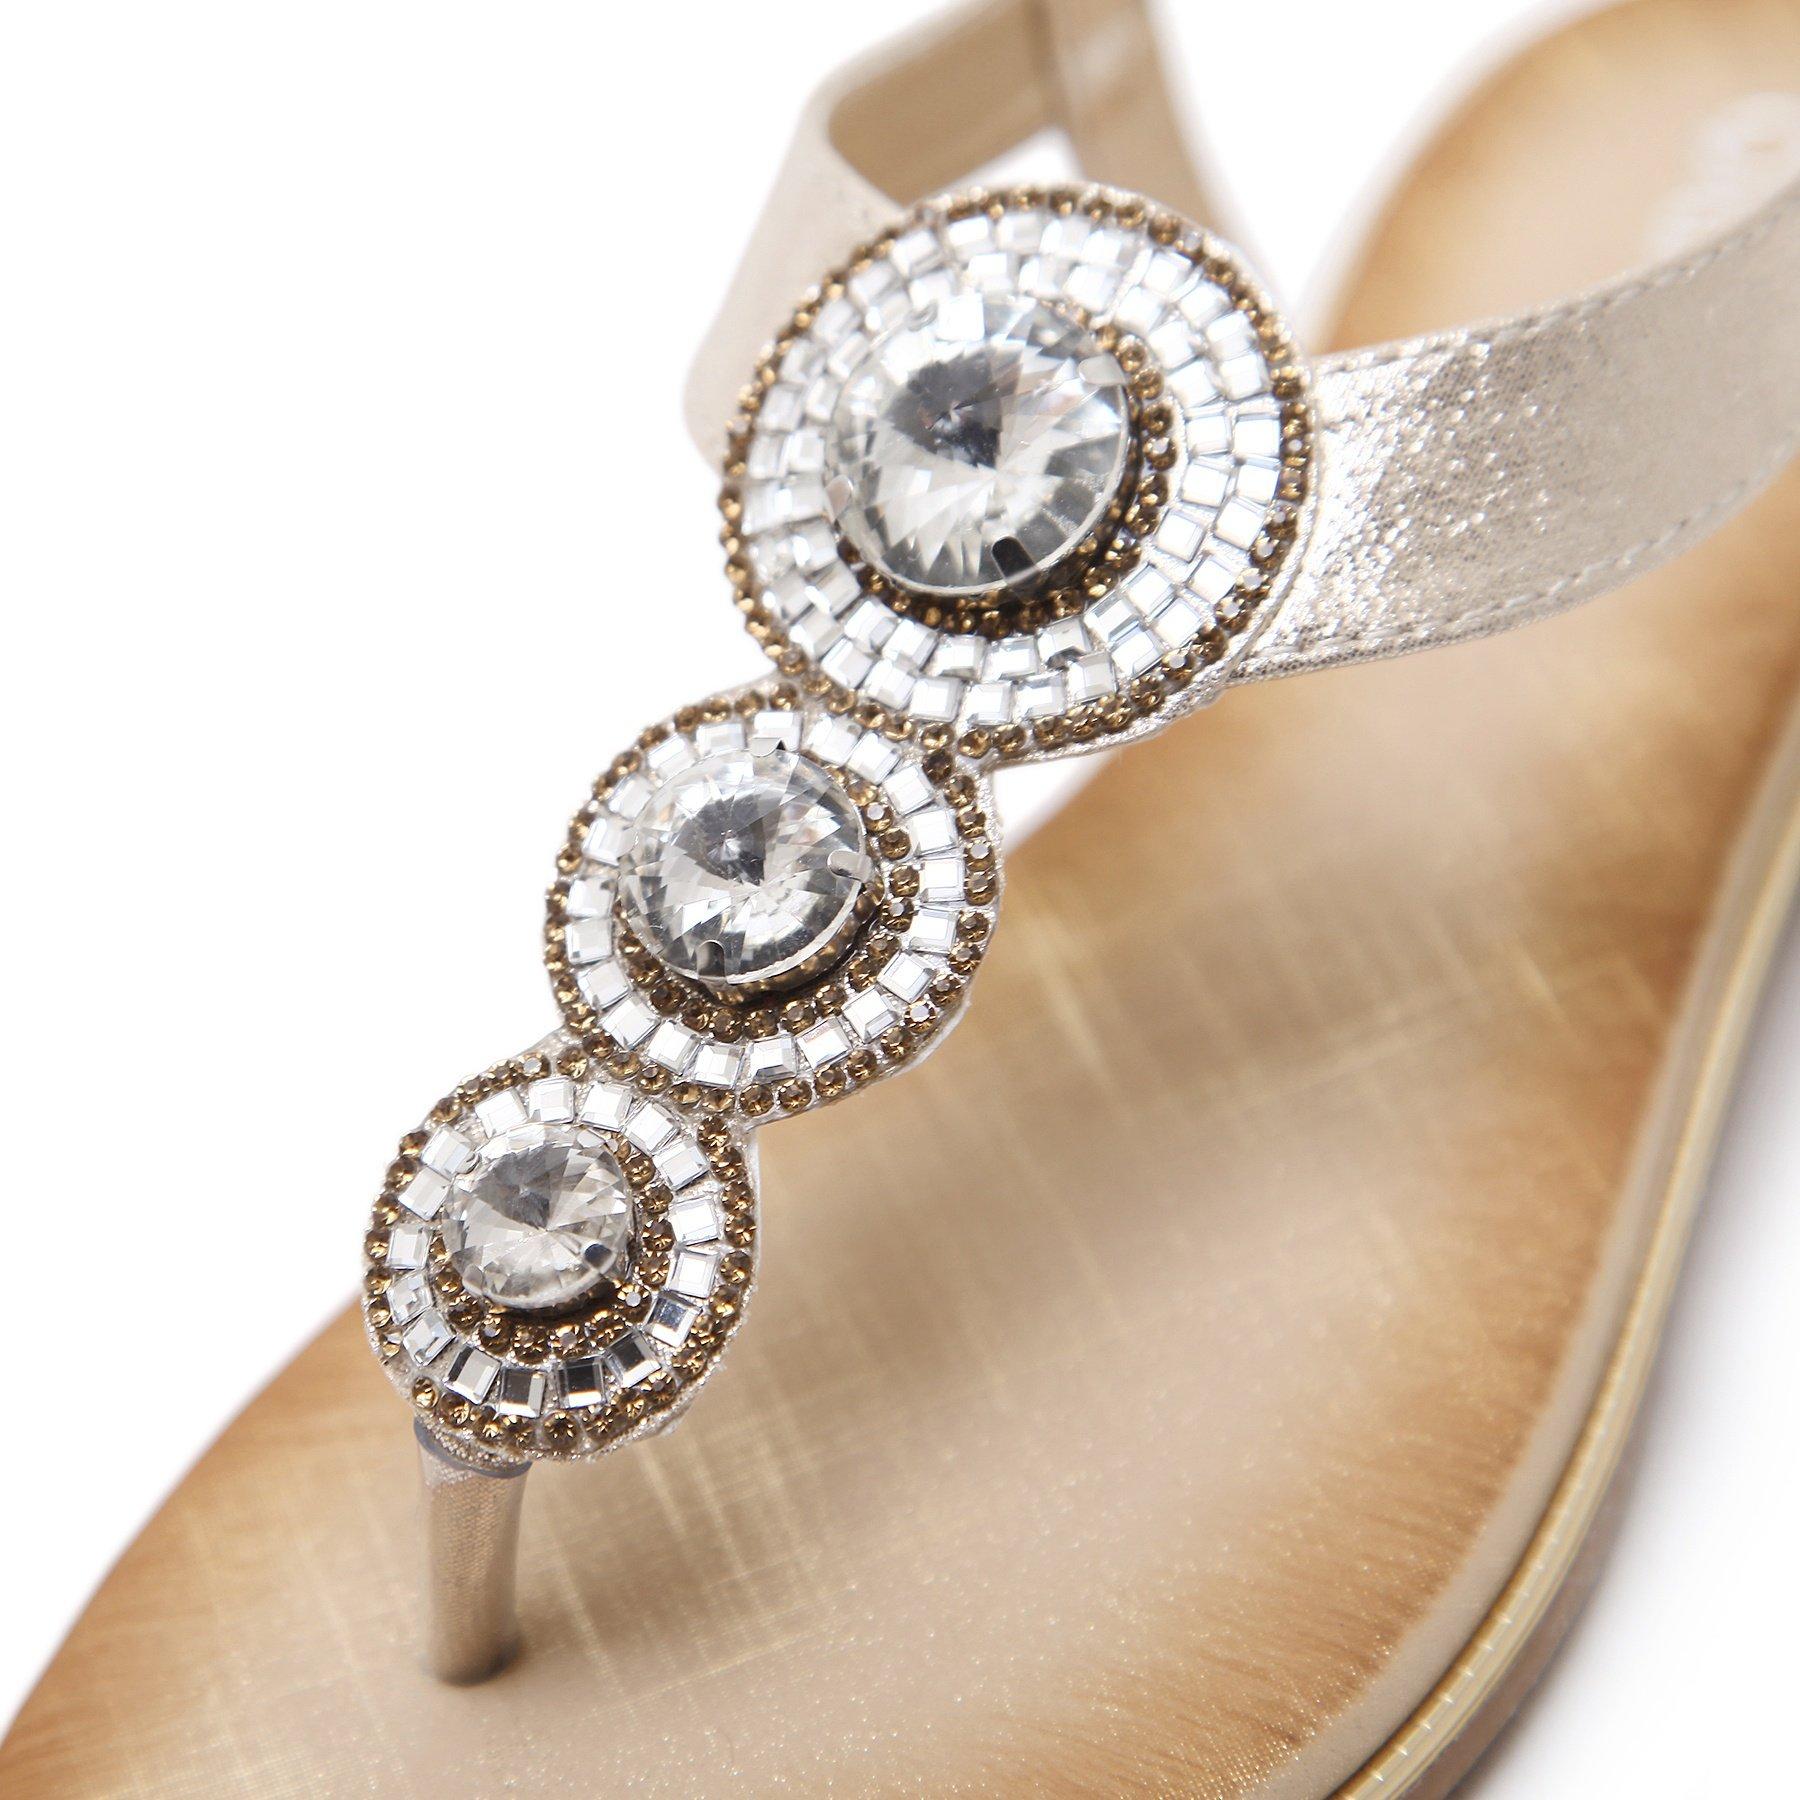 Meeshine Womens Flat Sandals Summer Rhinestone Comfort Bohemian Flip Flop Shoes Gold-02 US 8.5 by Meeshine (Image #4)